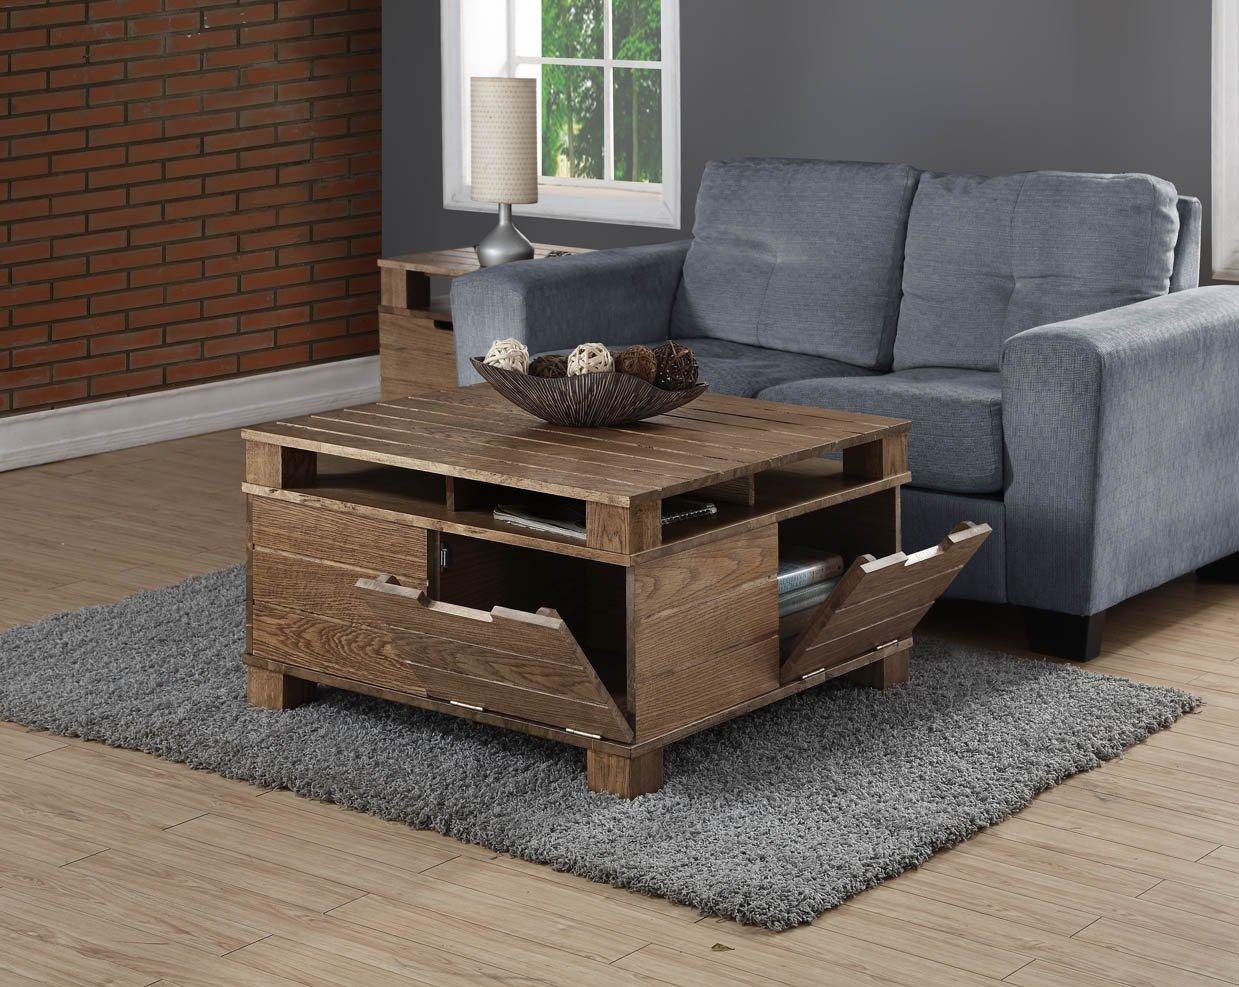 Jual Rustic Oak Solid Wood Coffee Table At Barnitts Online